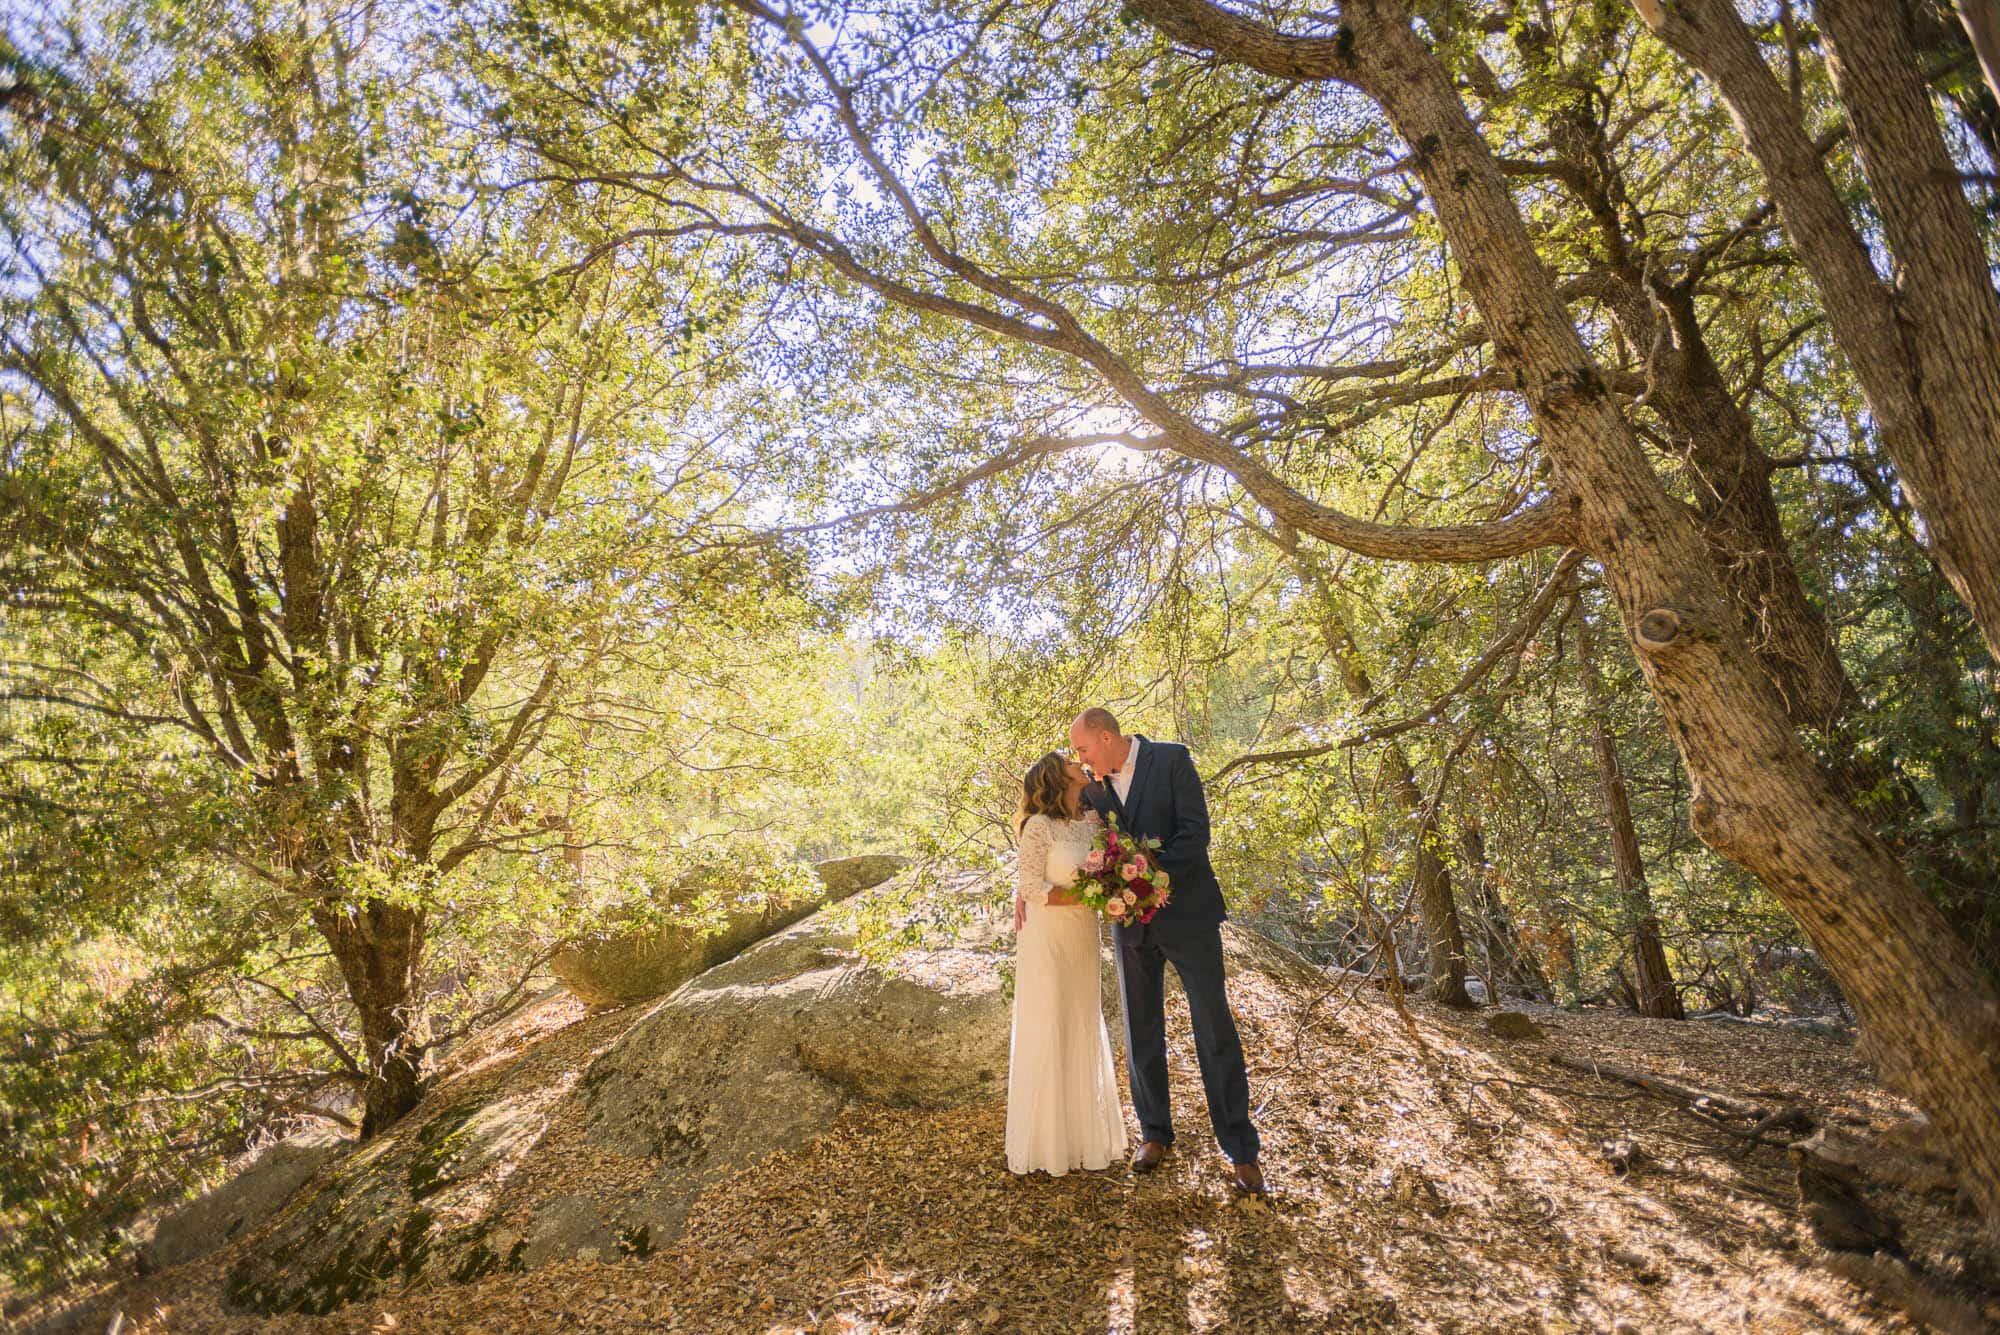 028_Alan_and_Heidi_Wedding_Jackie_Dannon